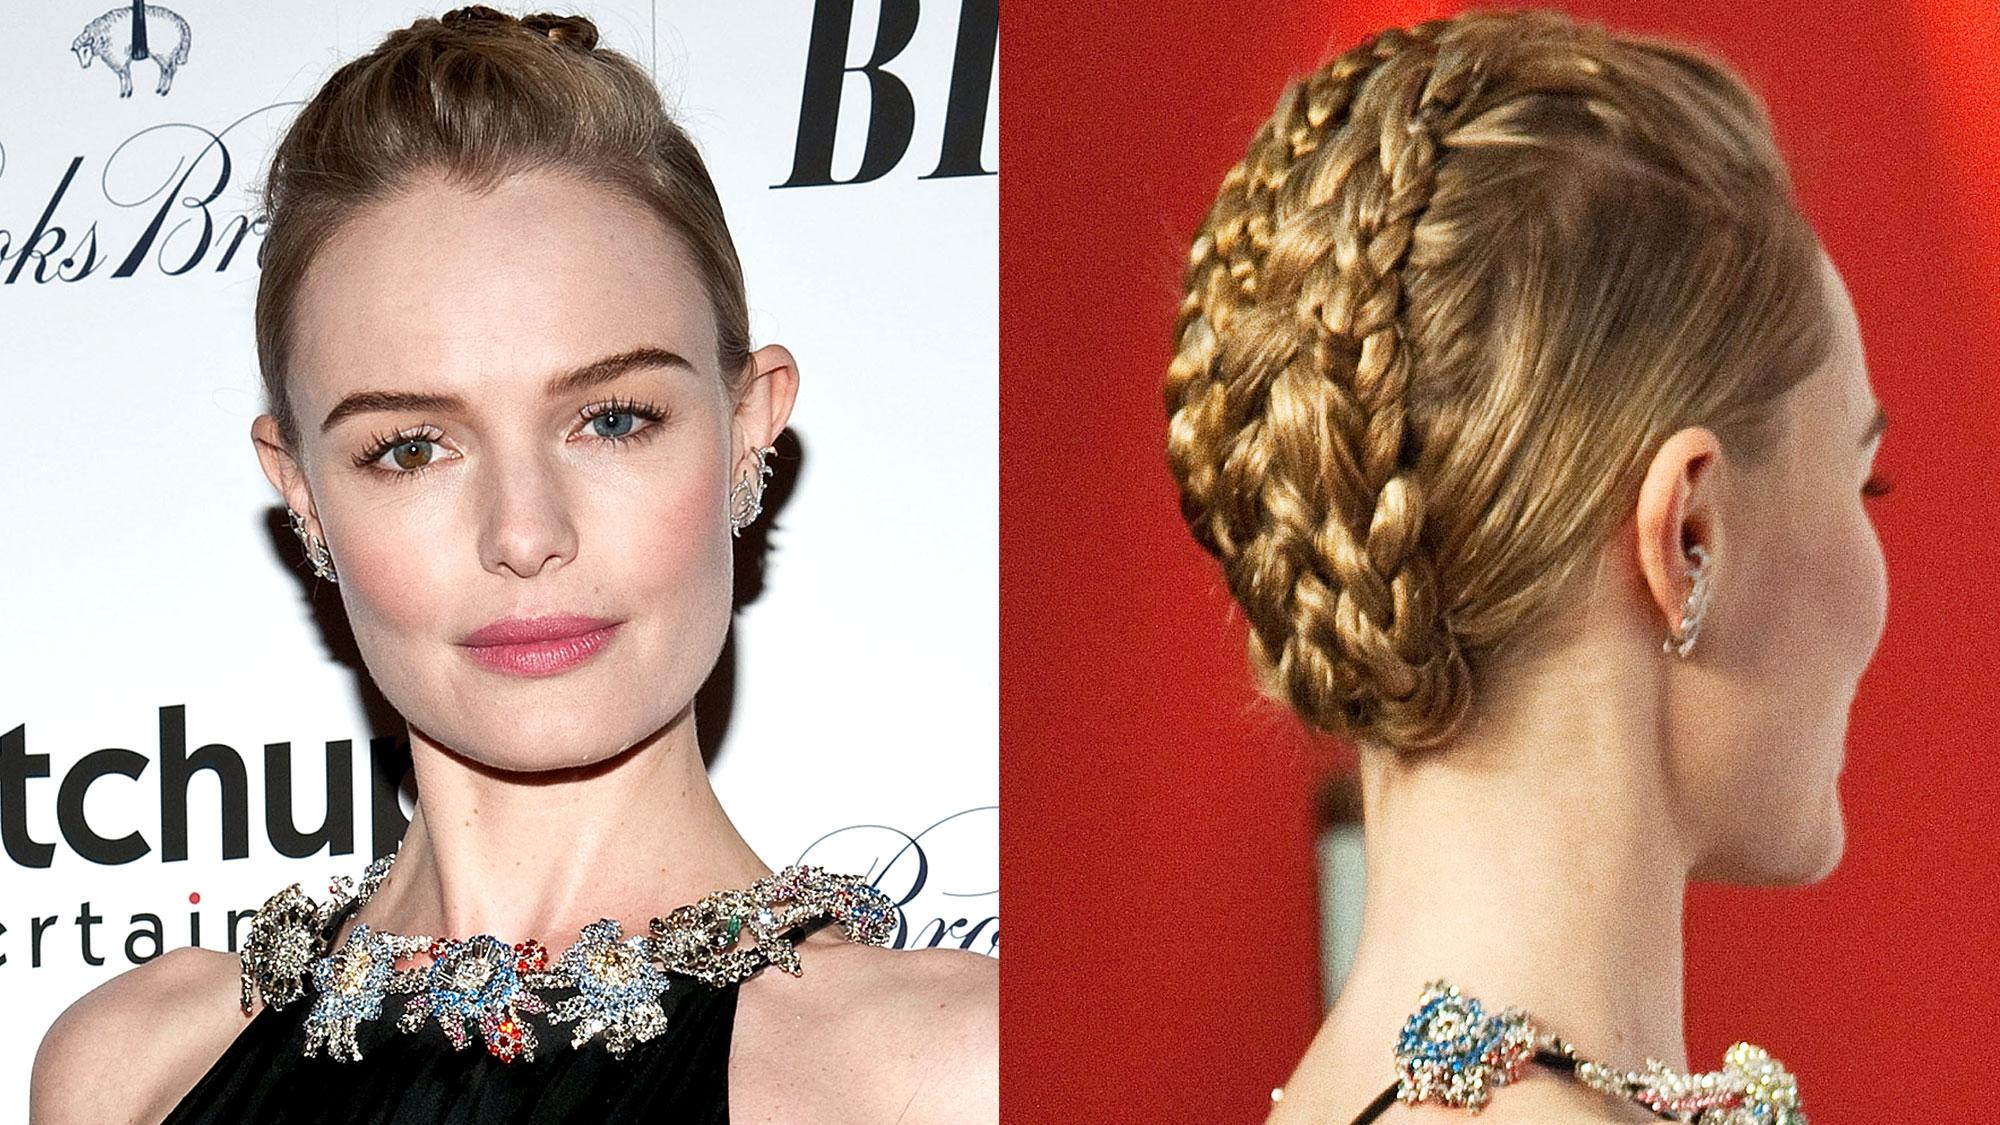 Strange 18 Best Braided Hairstyles Best Crown Side And French Braid Ideas Hairstyles For Women Draintrainus